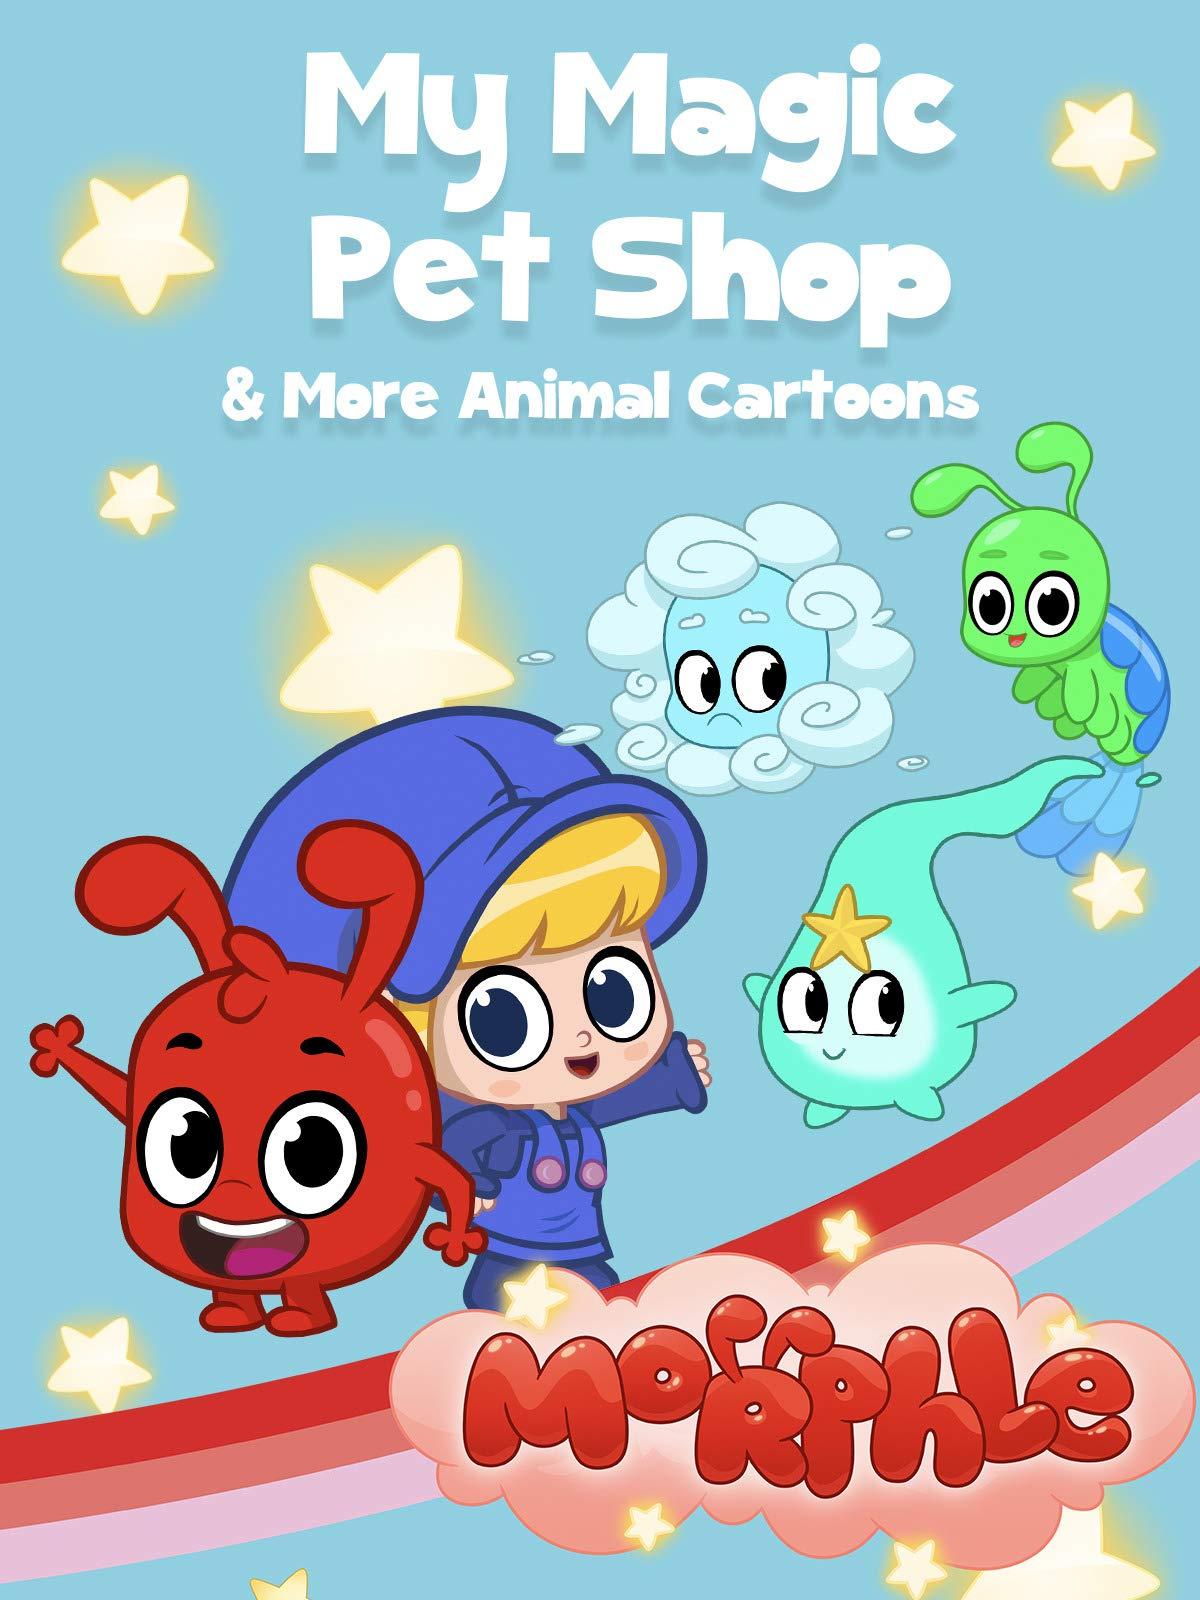 Morphle - My Magic Pet Shop & More Animal Cartoons